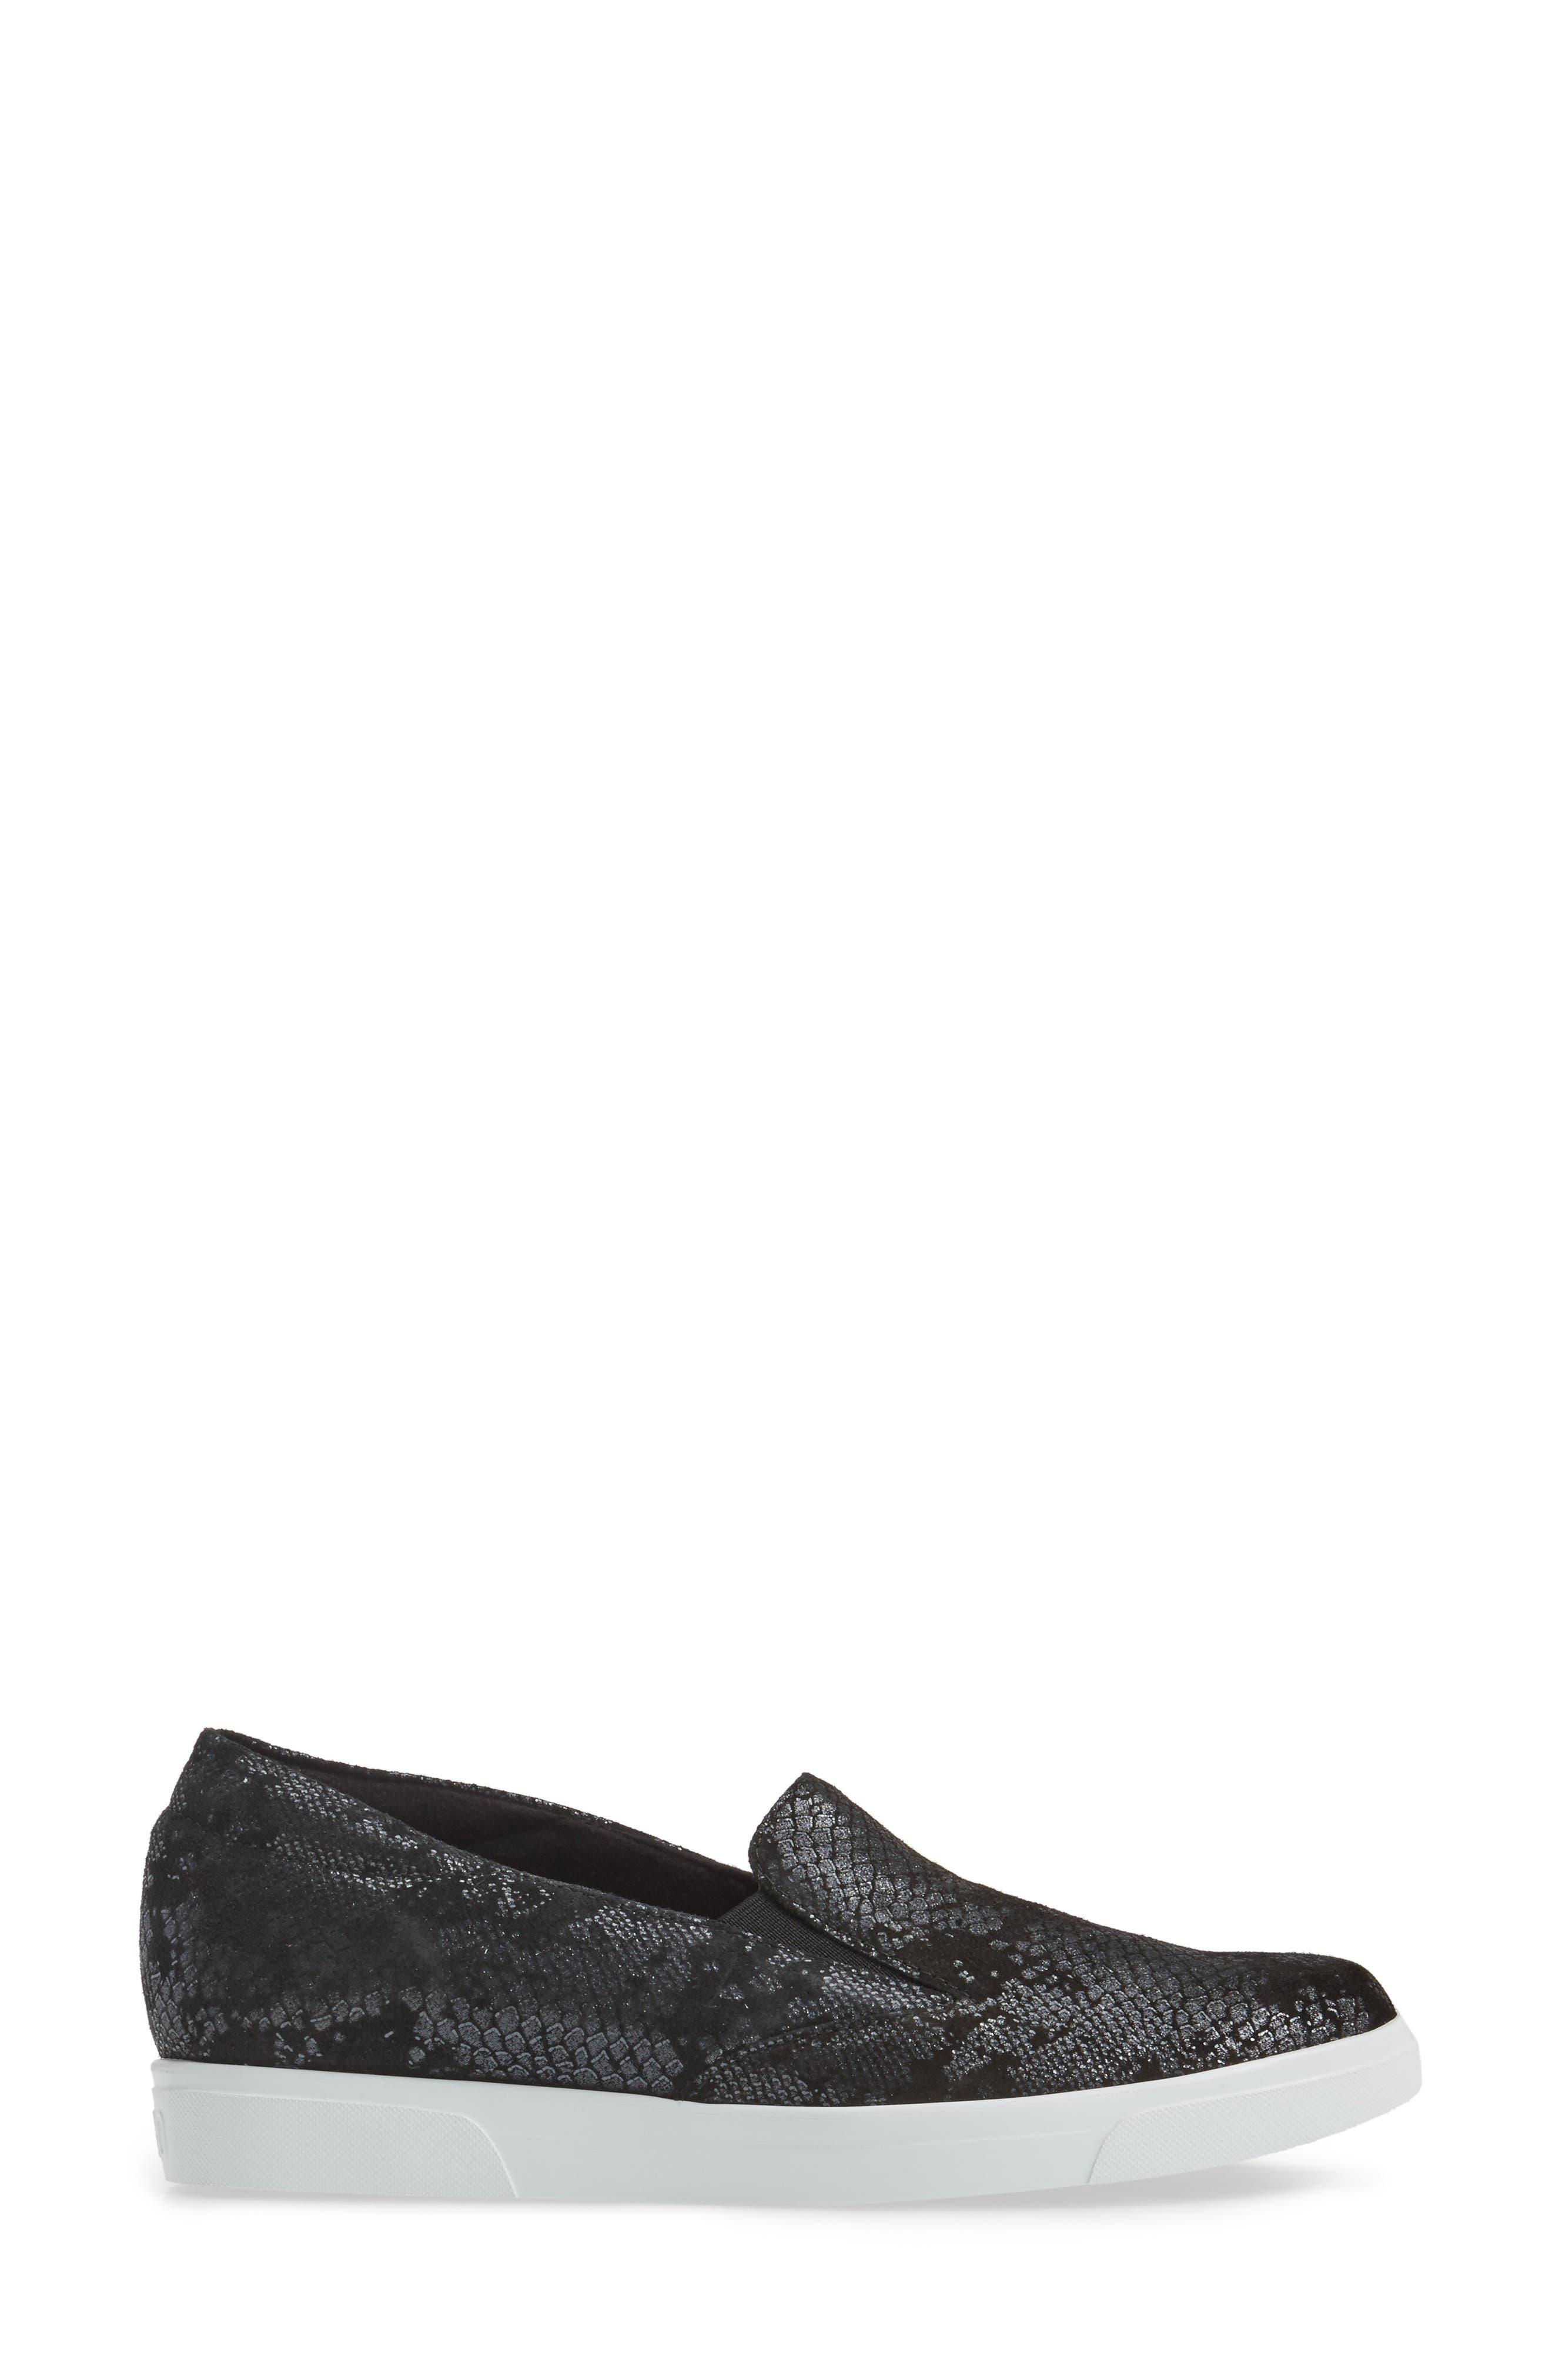 Alternate Image 3  - Munro Lulu Slip-On Sneaker (Women)